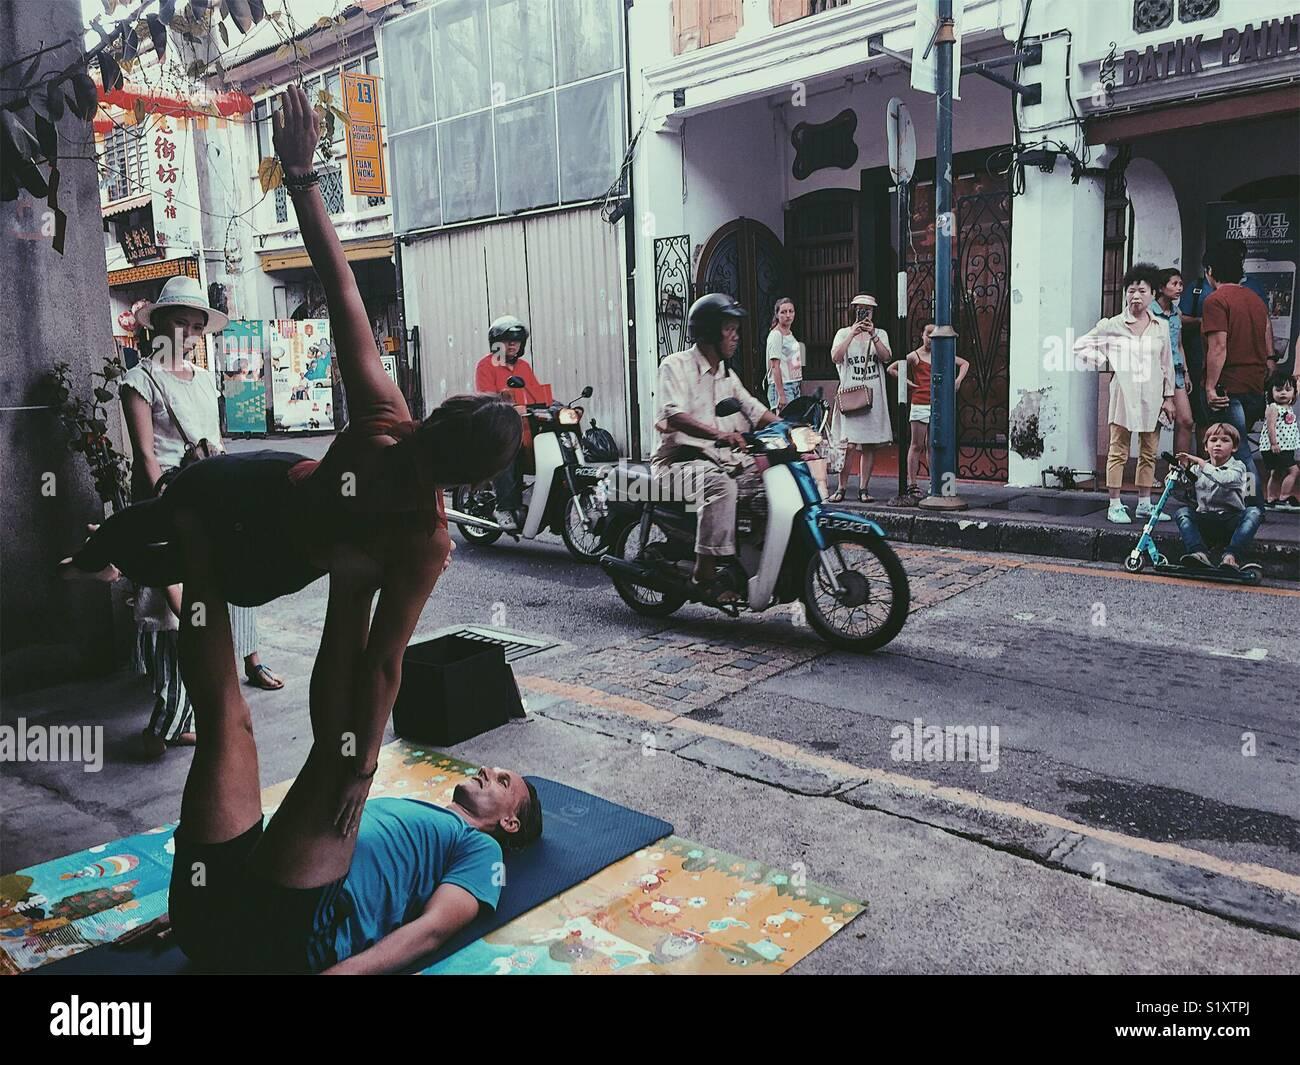 Espectáculo de calle en Armenian Street, George Town, Malasia Imagen De Stock